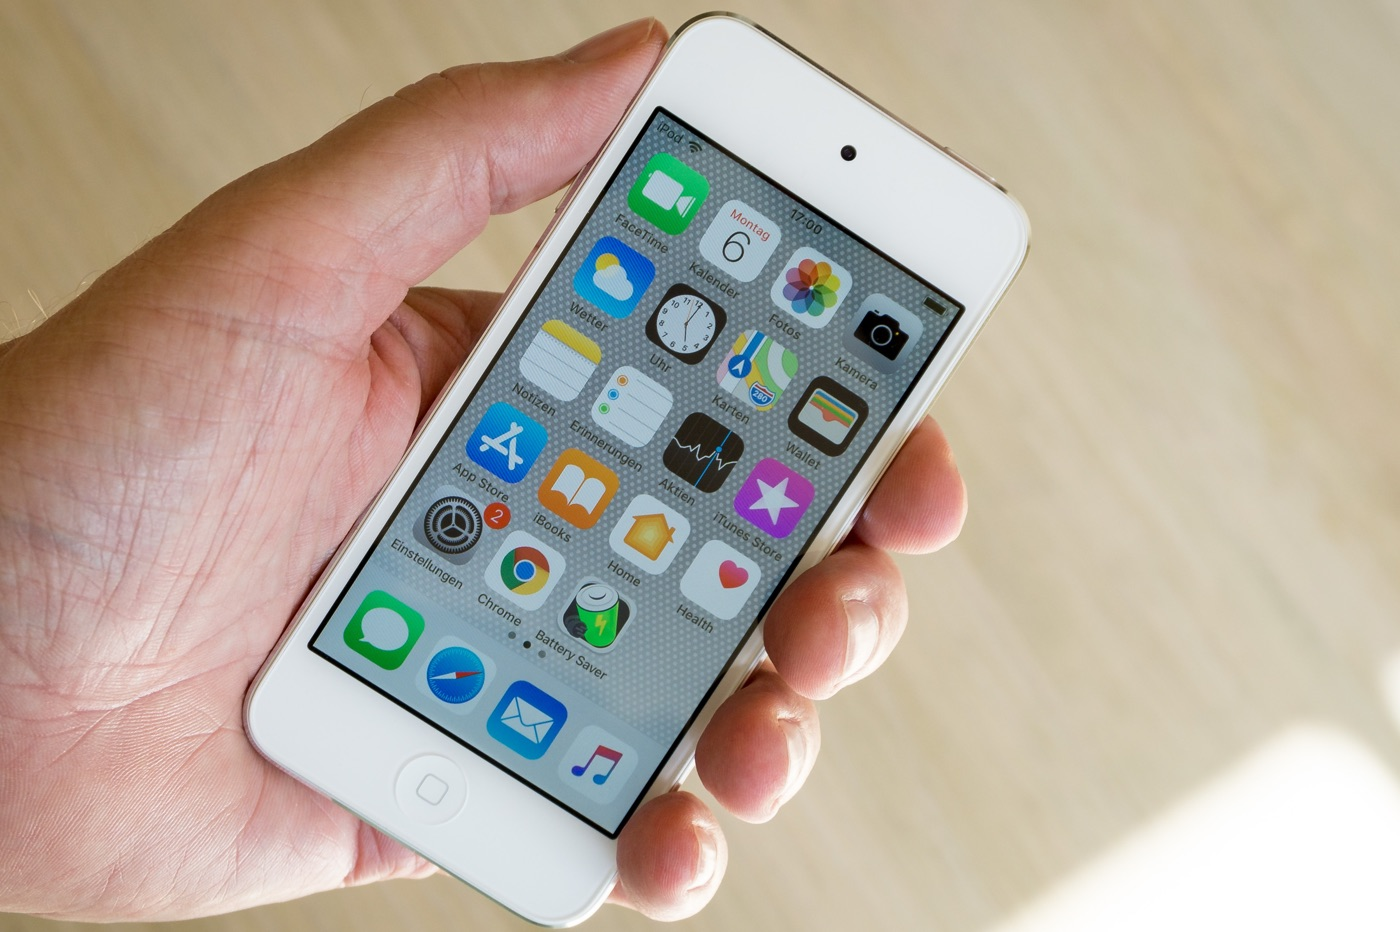 Vieil iPhone et bug GPS